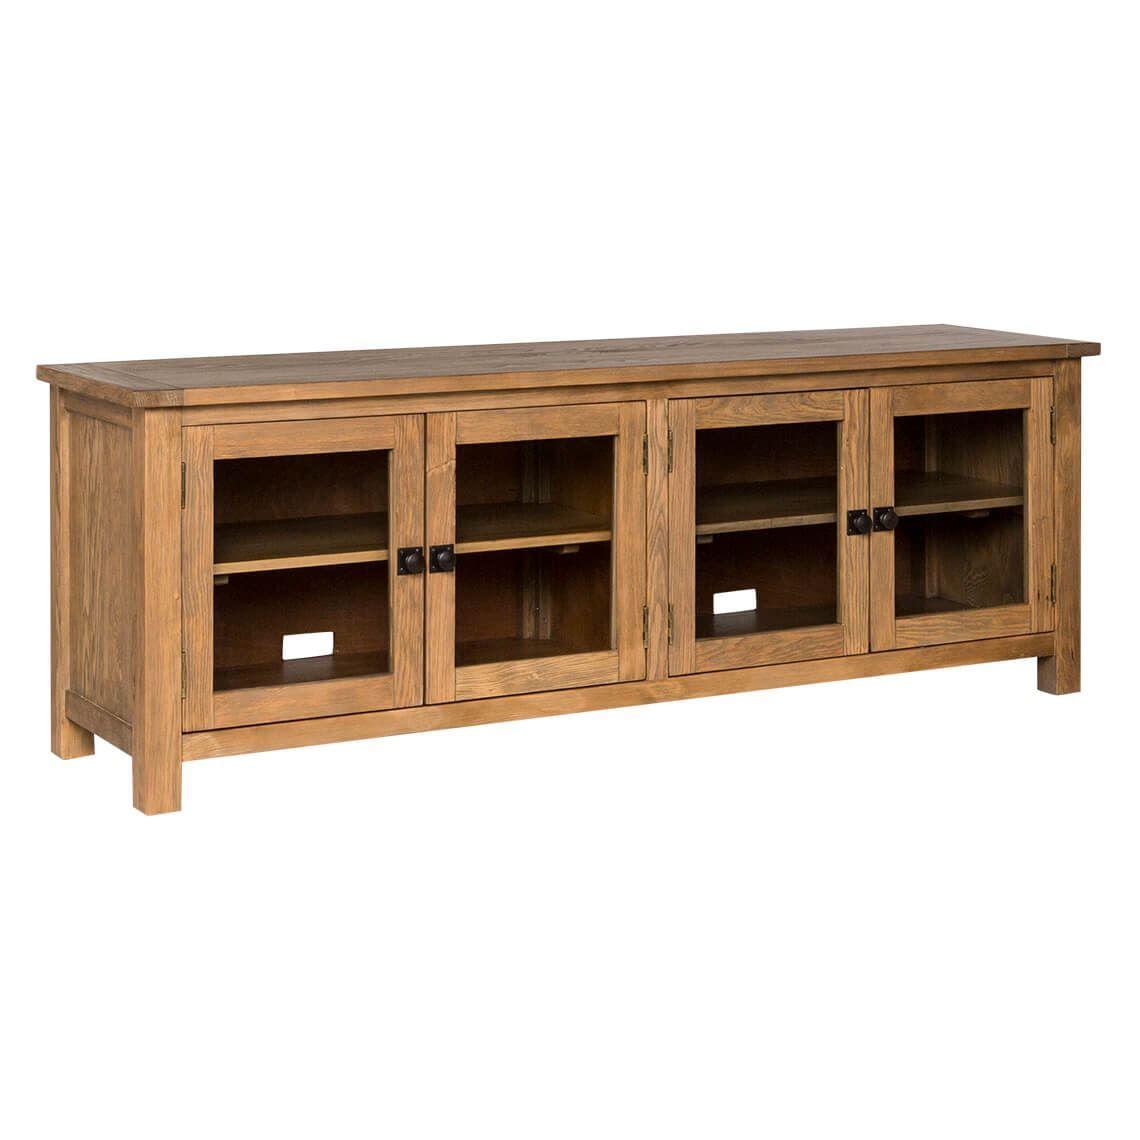 Homestead Entertainment Unit Natural Freedom Furniture Living Storage Furniture